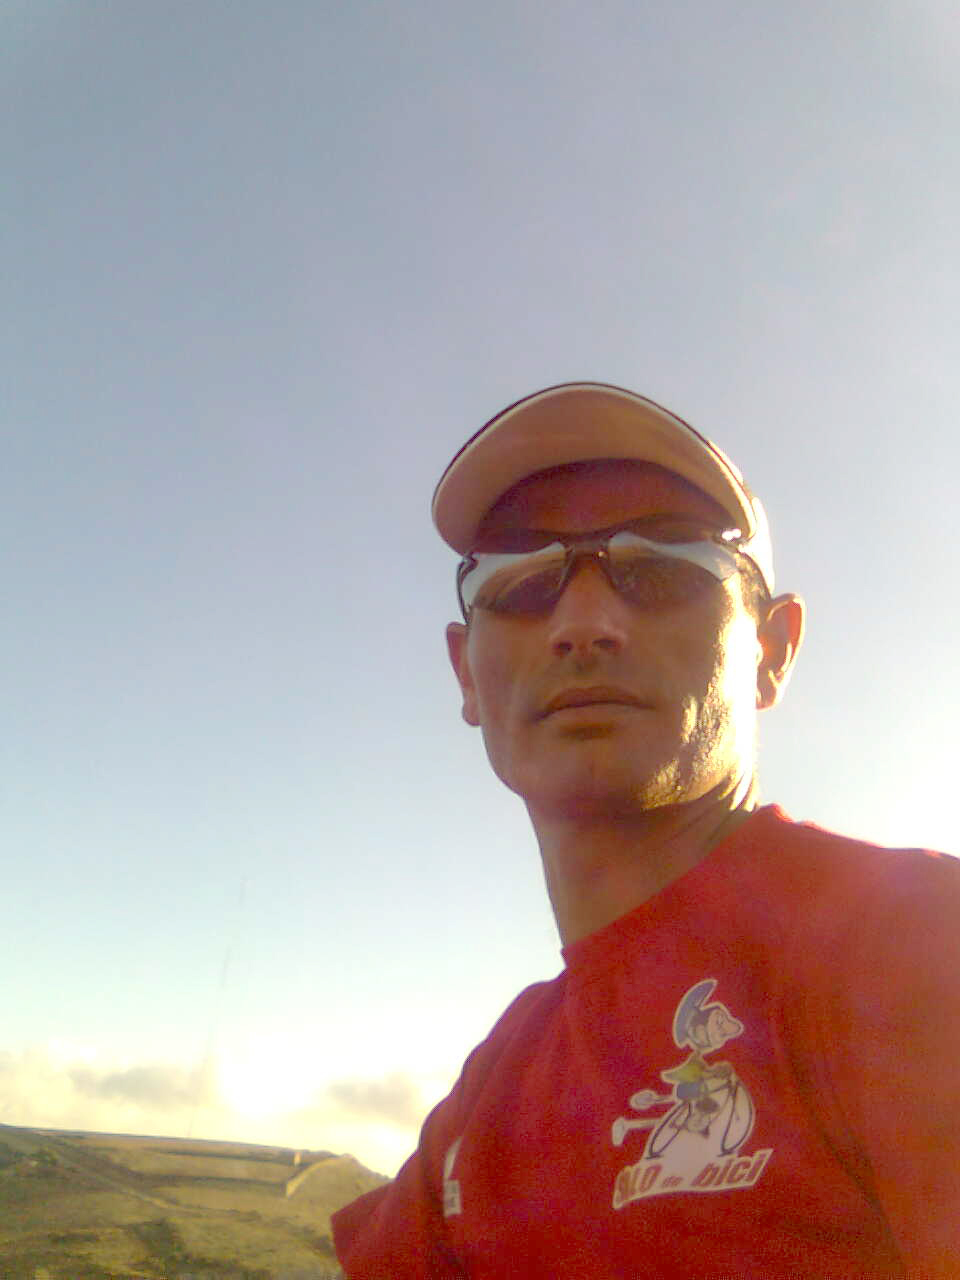 Gilbert Lanzarote